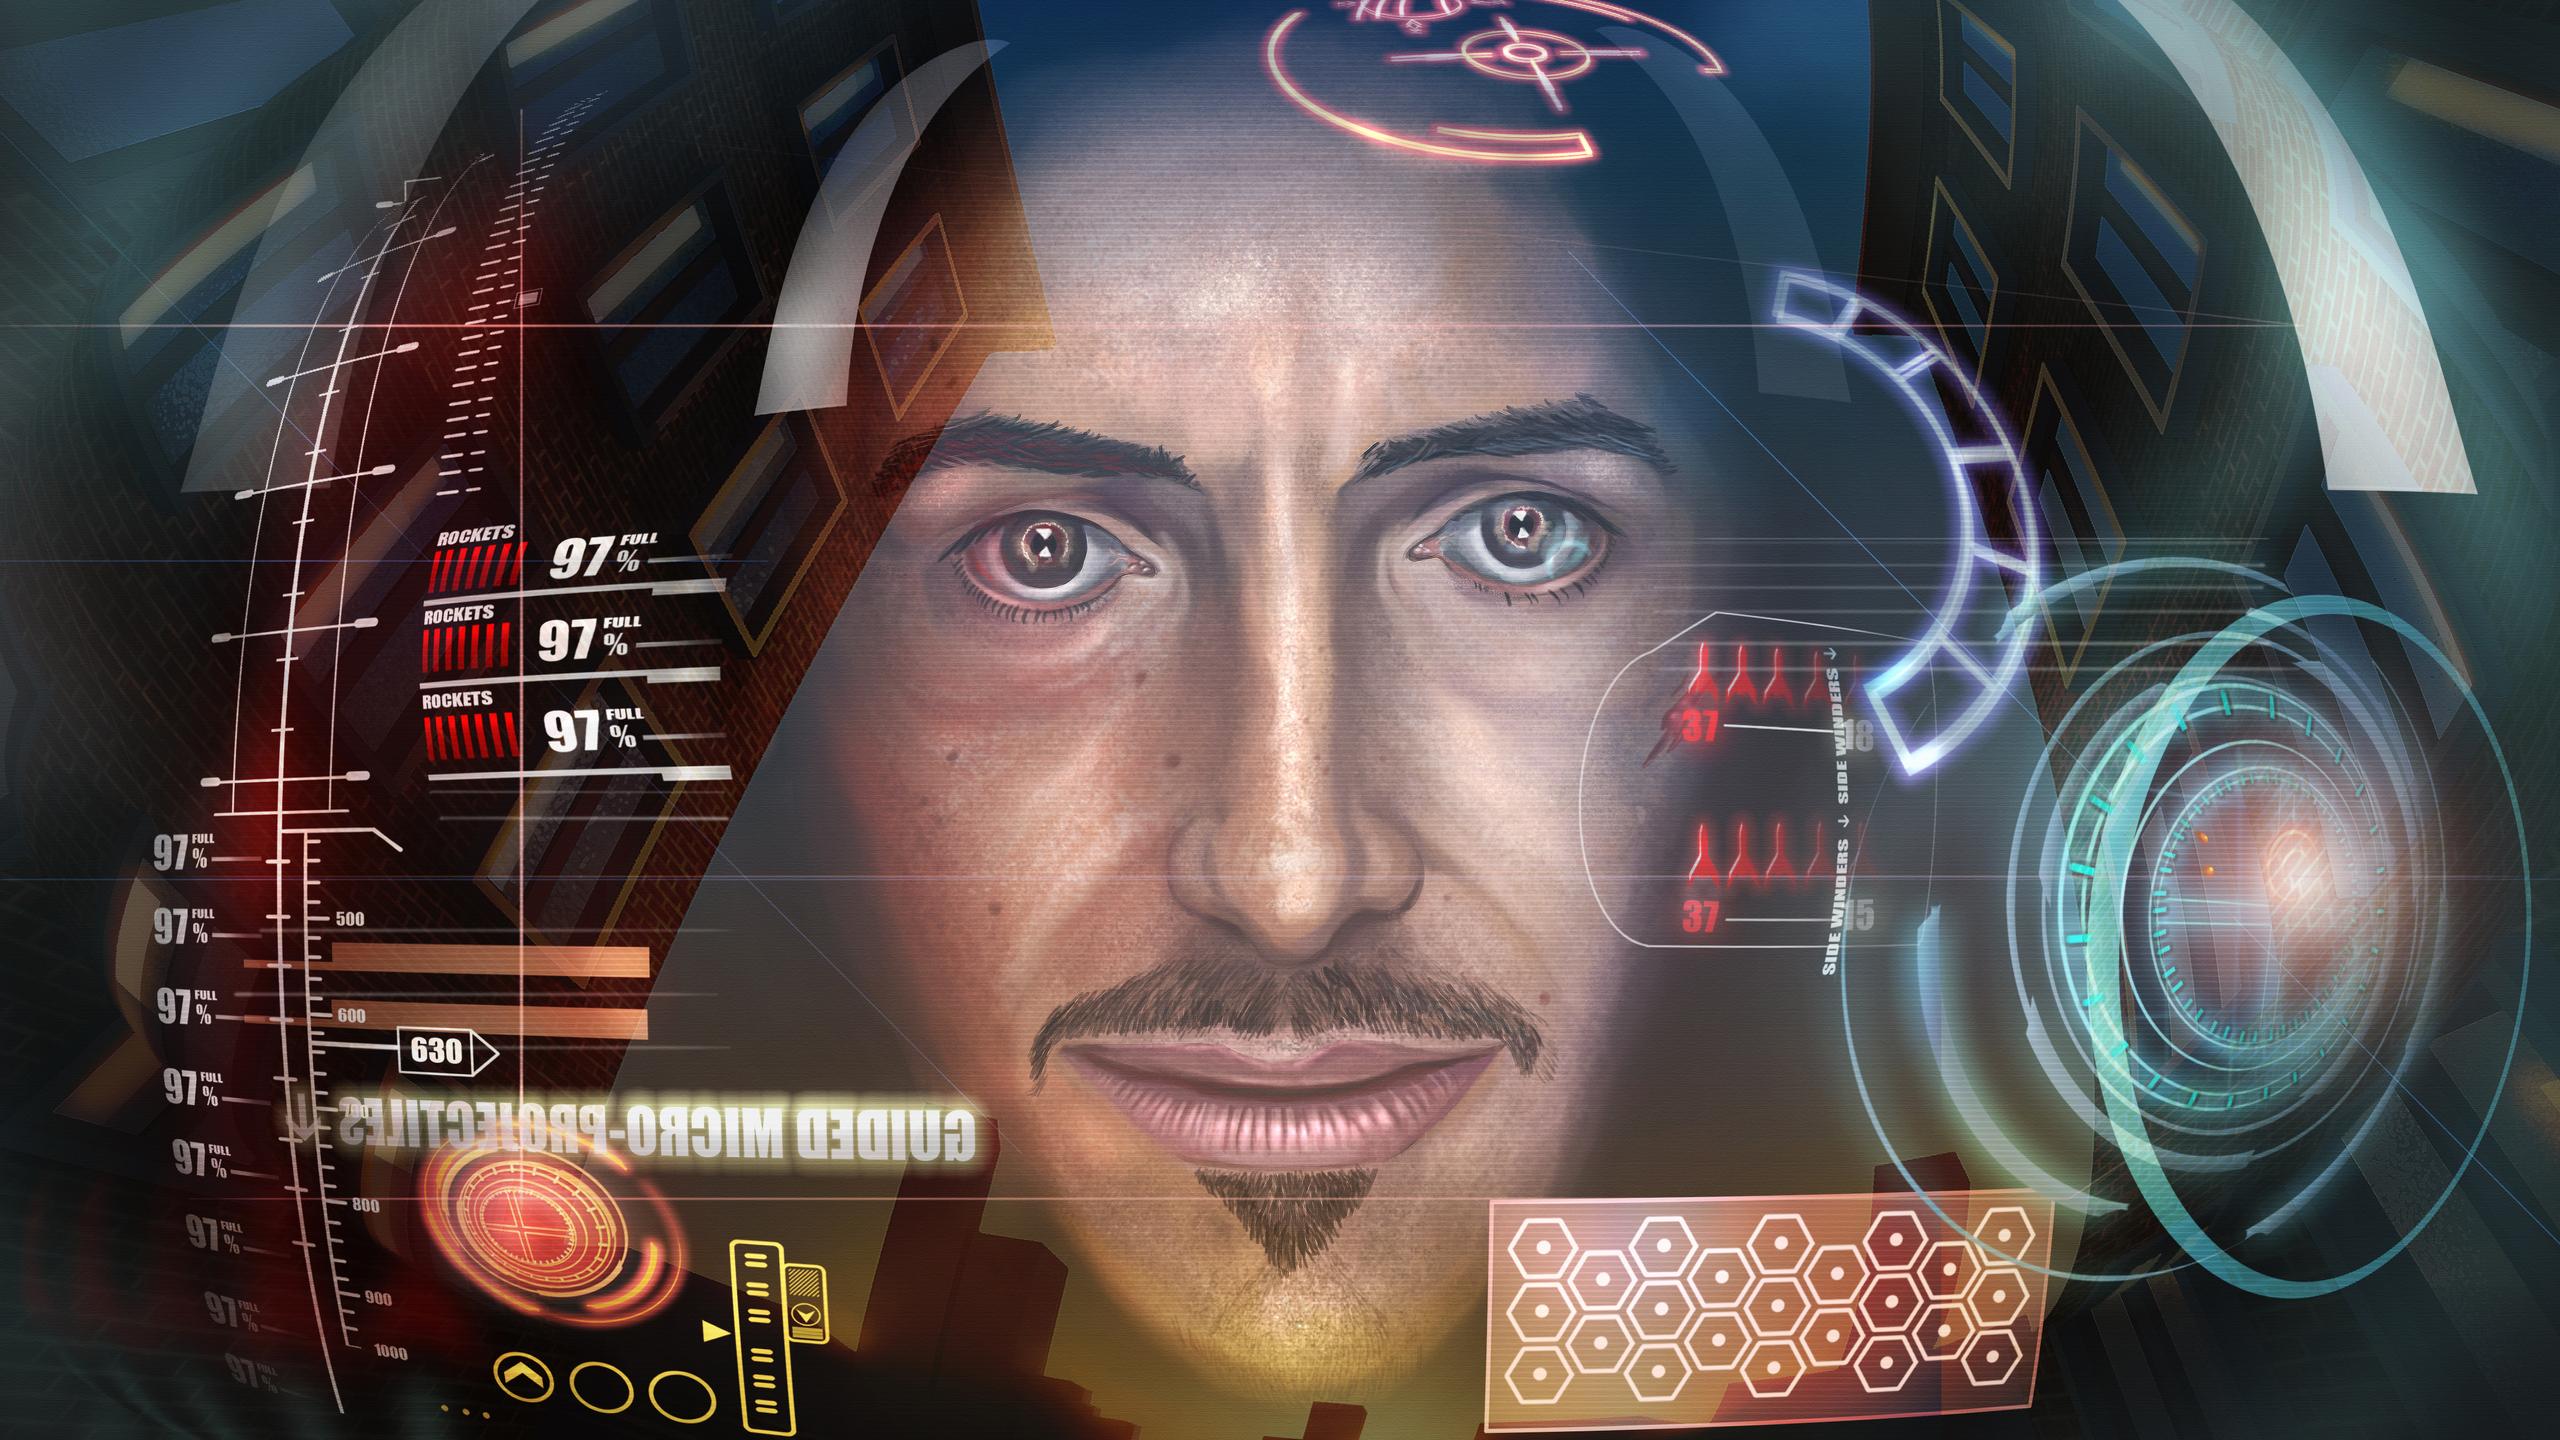 2560x1440 Iron Man Hud Inside 1440p Resolution Hd 4k